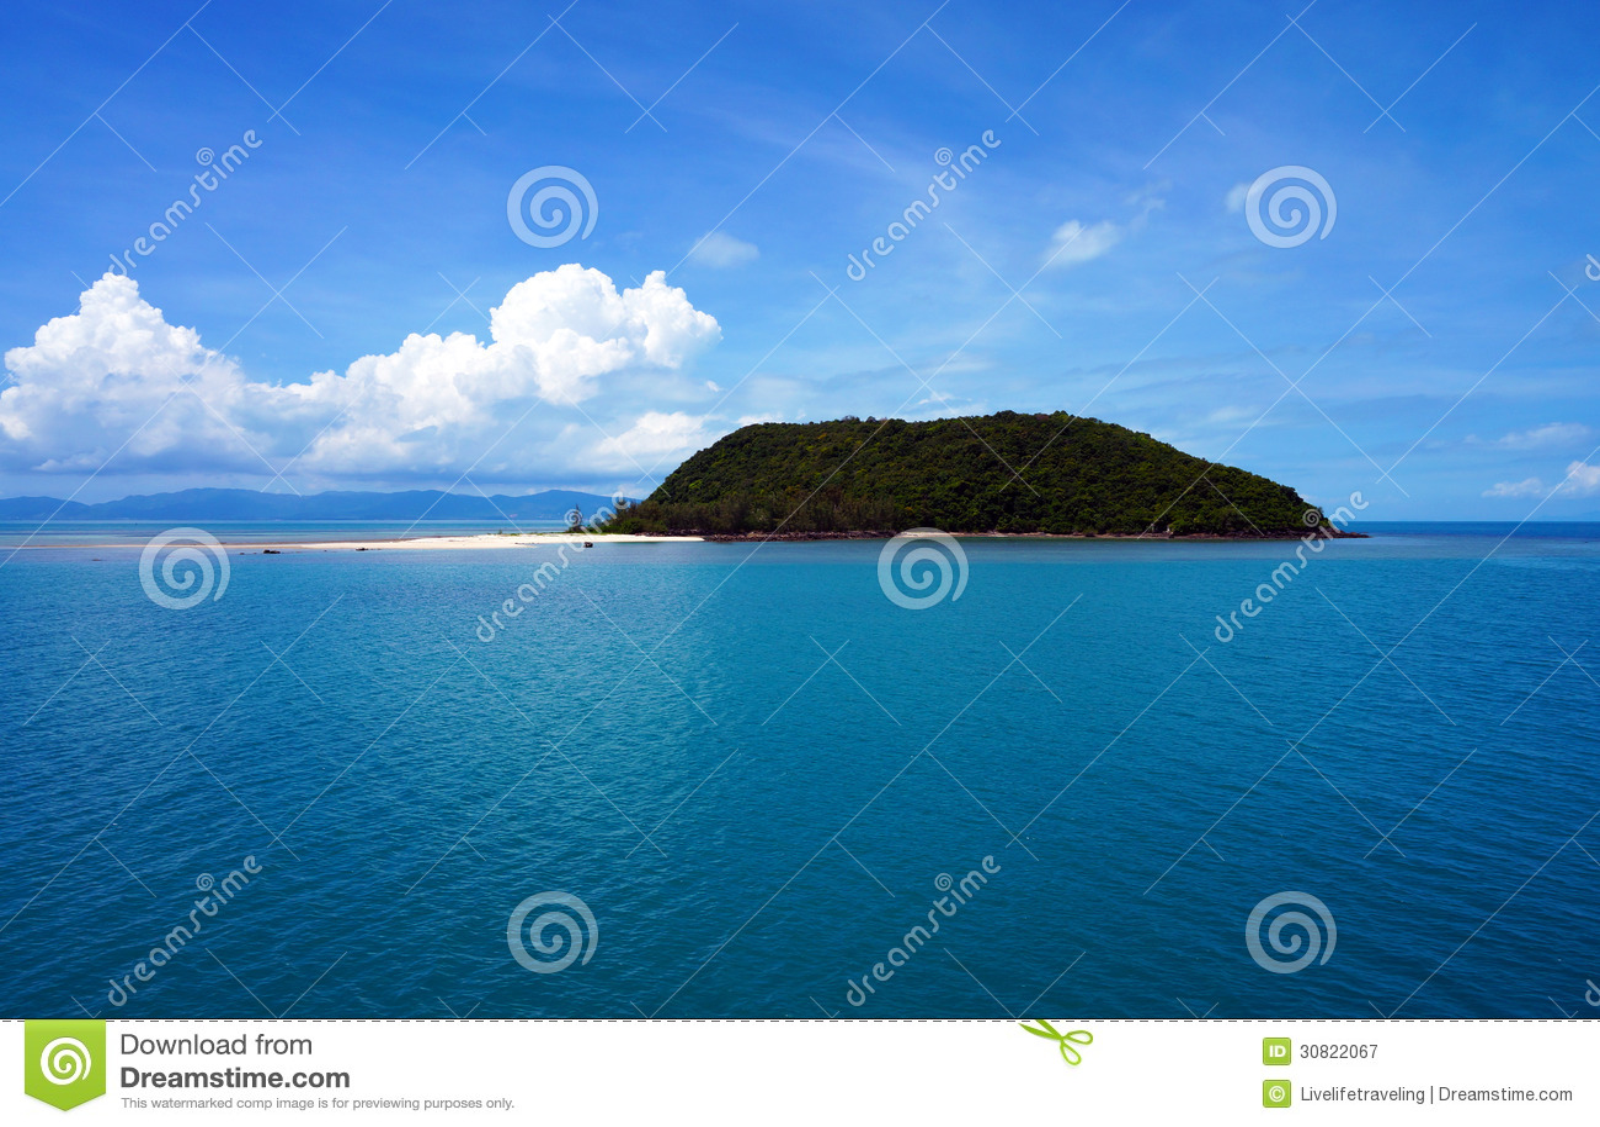 koh tae nai island royalty free stock photography